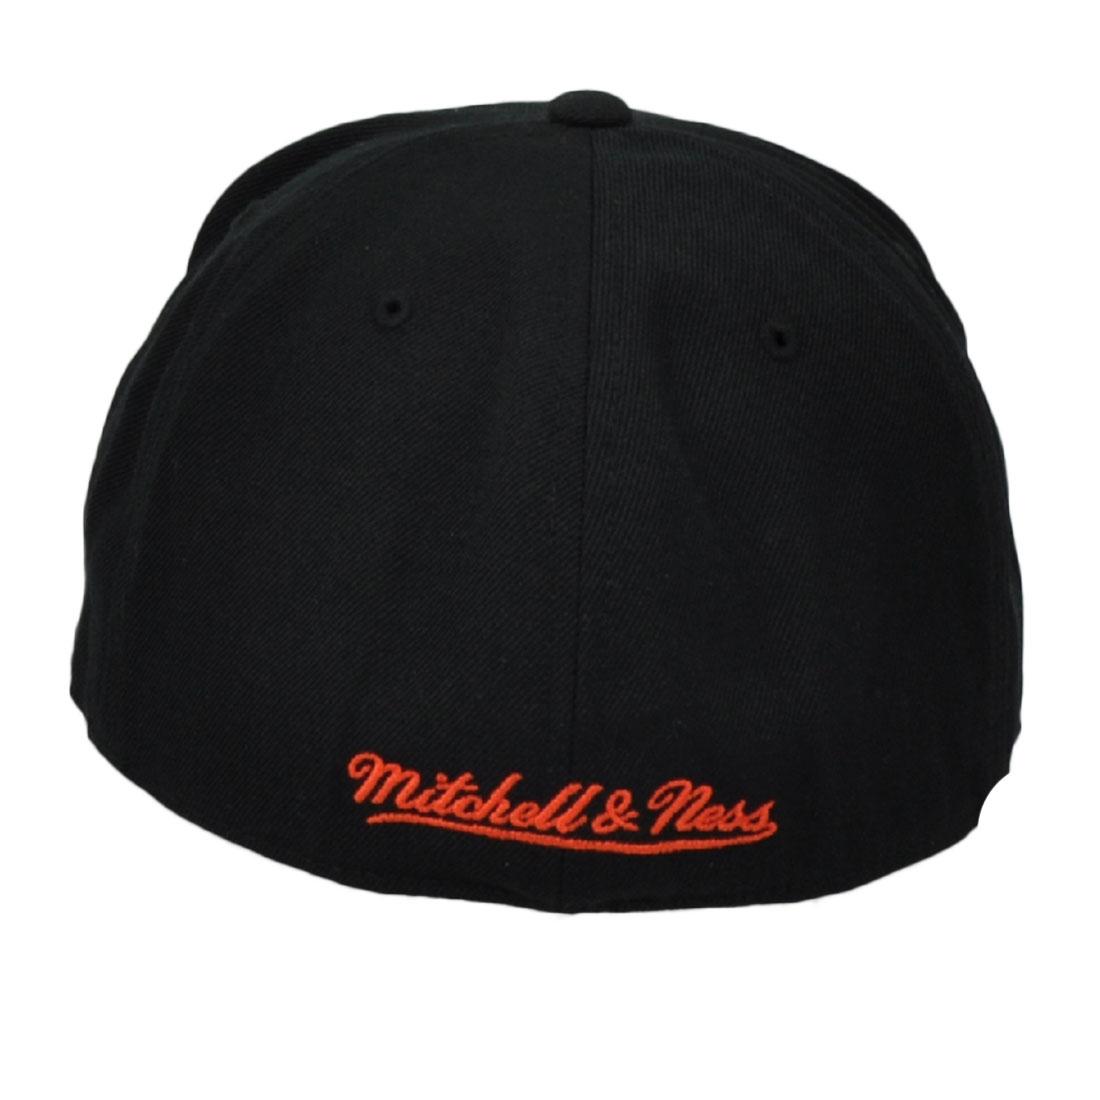 442598439fd NHL Mitchell Ness Philadelphia Flyers Vintage Hockey Hat Cap Black Fitted  Size